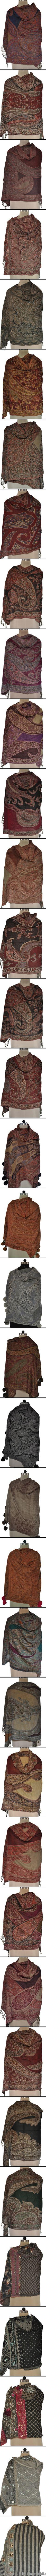 Designer #shawls for sale online at Baba Black Sheep. We have variety of designer shawls for #women. Find our great designer shawls collection here.